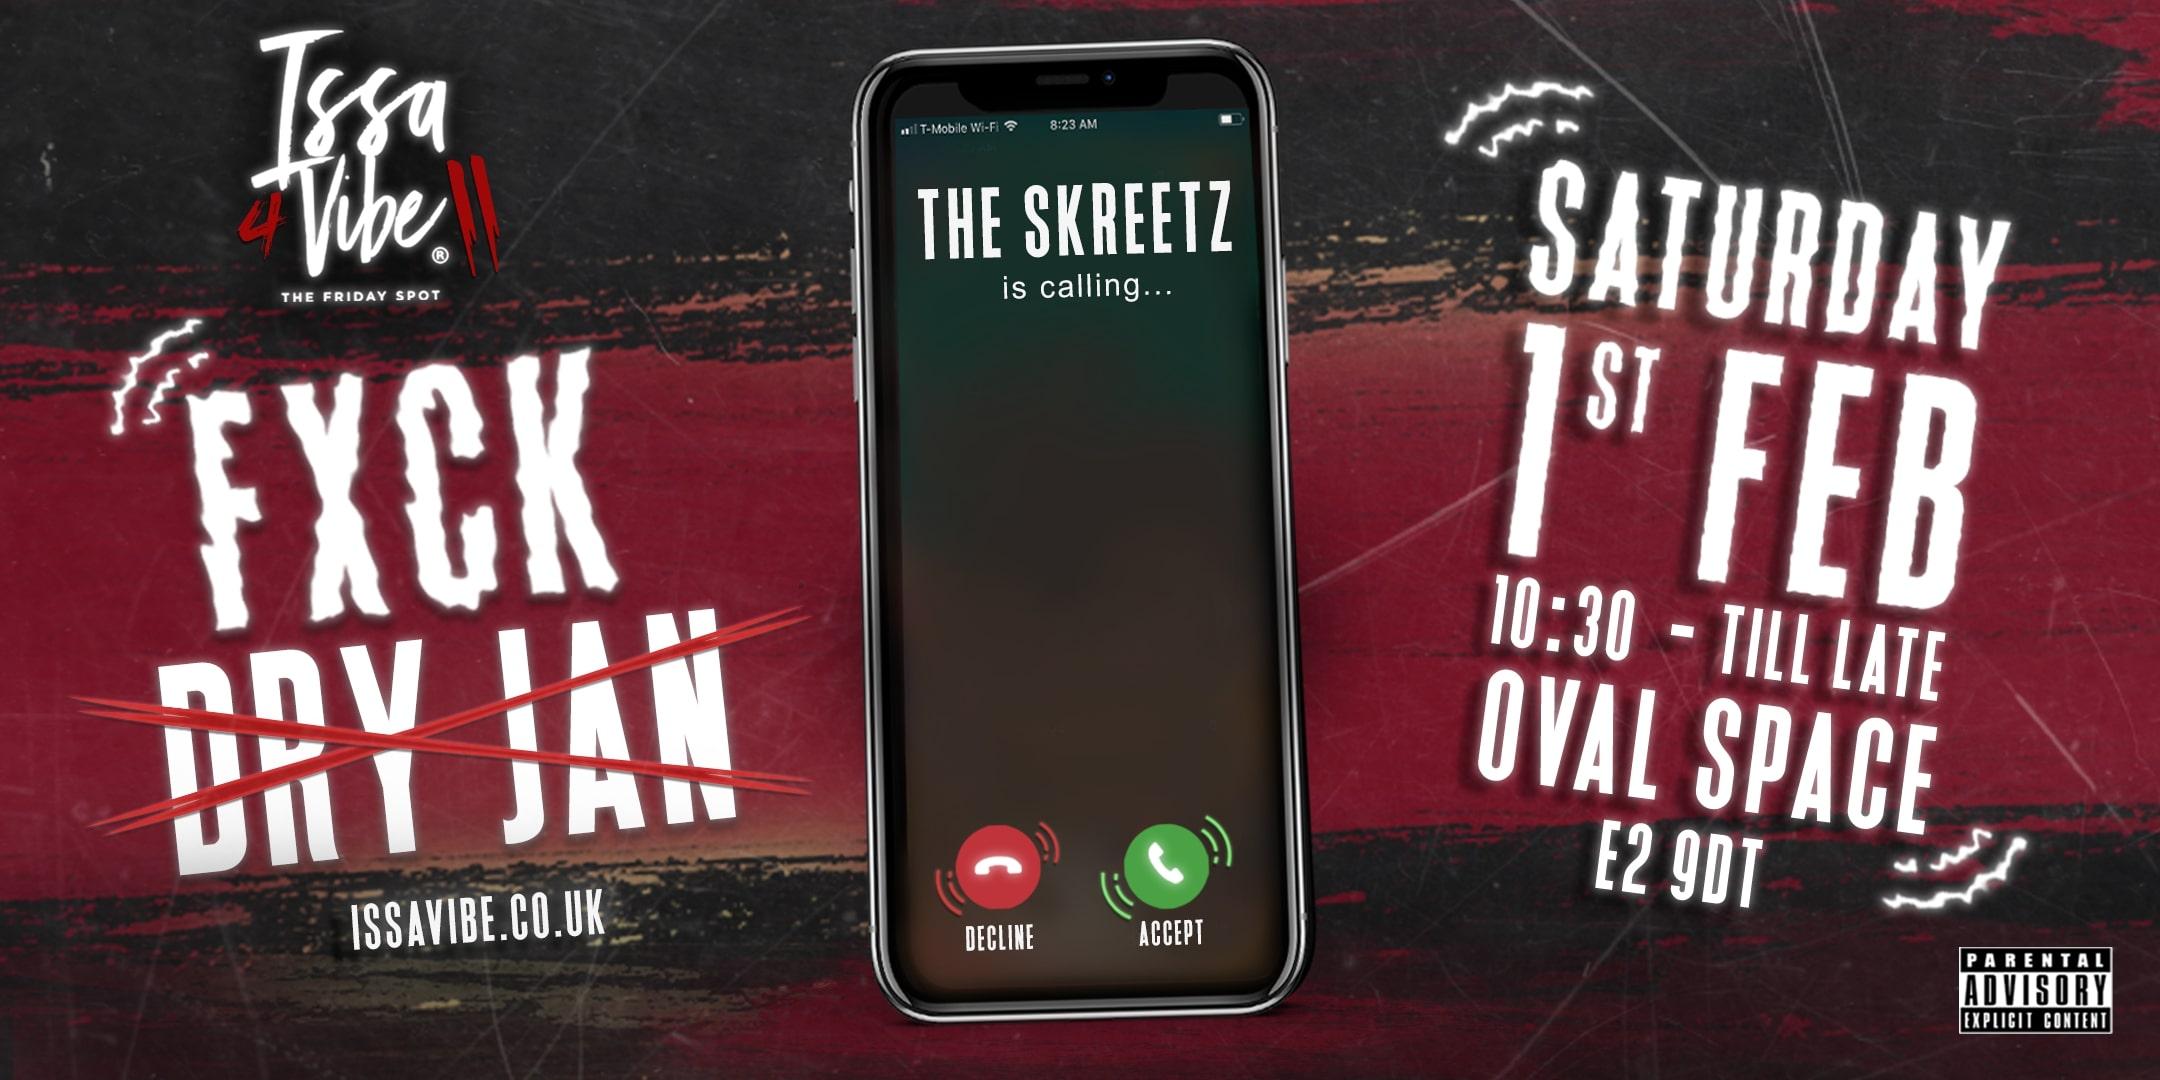 Issa Vibe – FXCK DRY JAN – THE SKREETZ IS CALLING